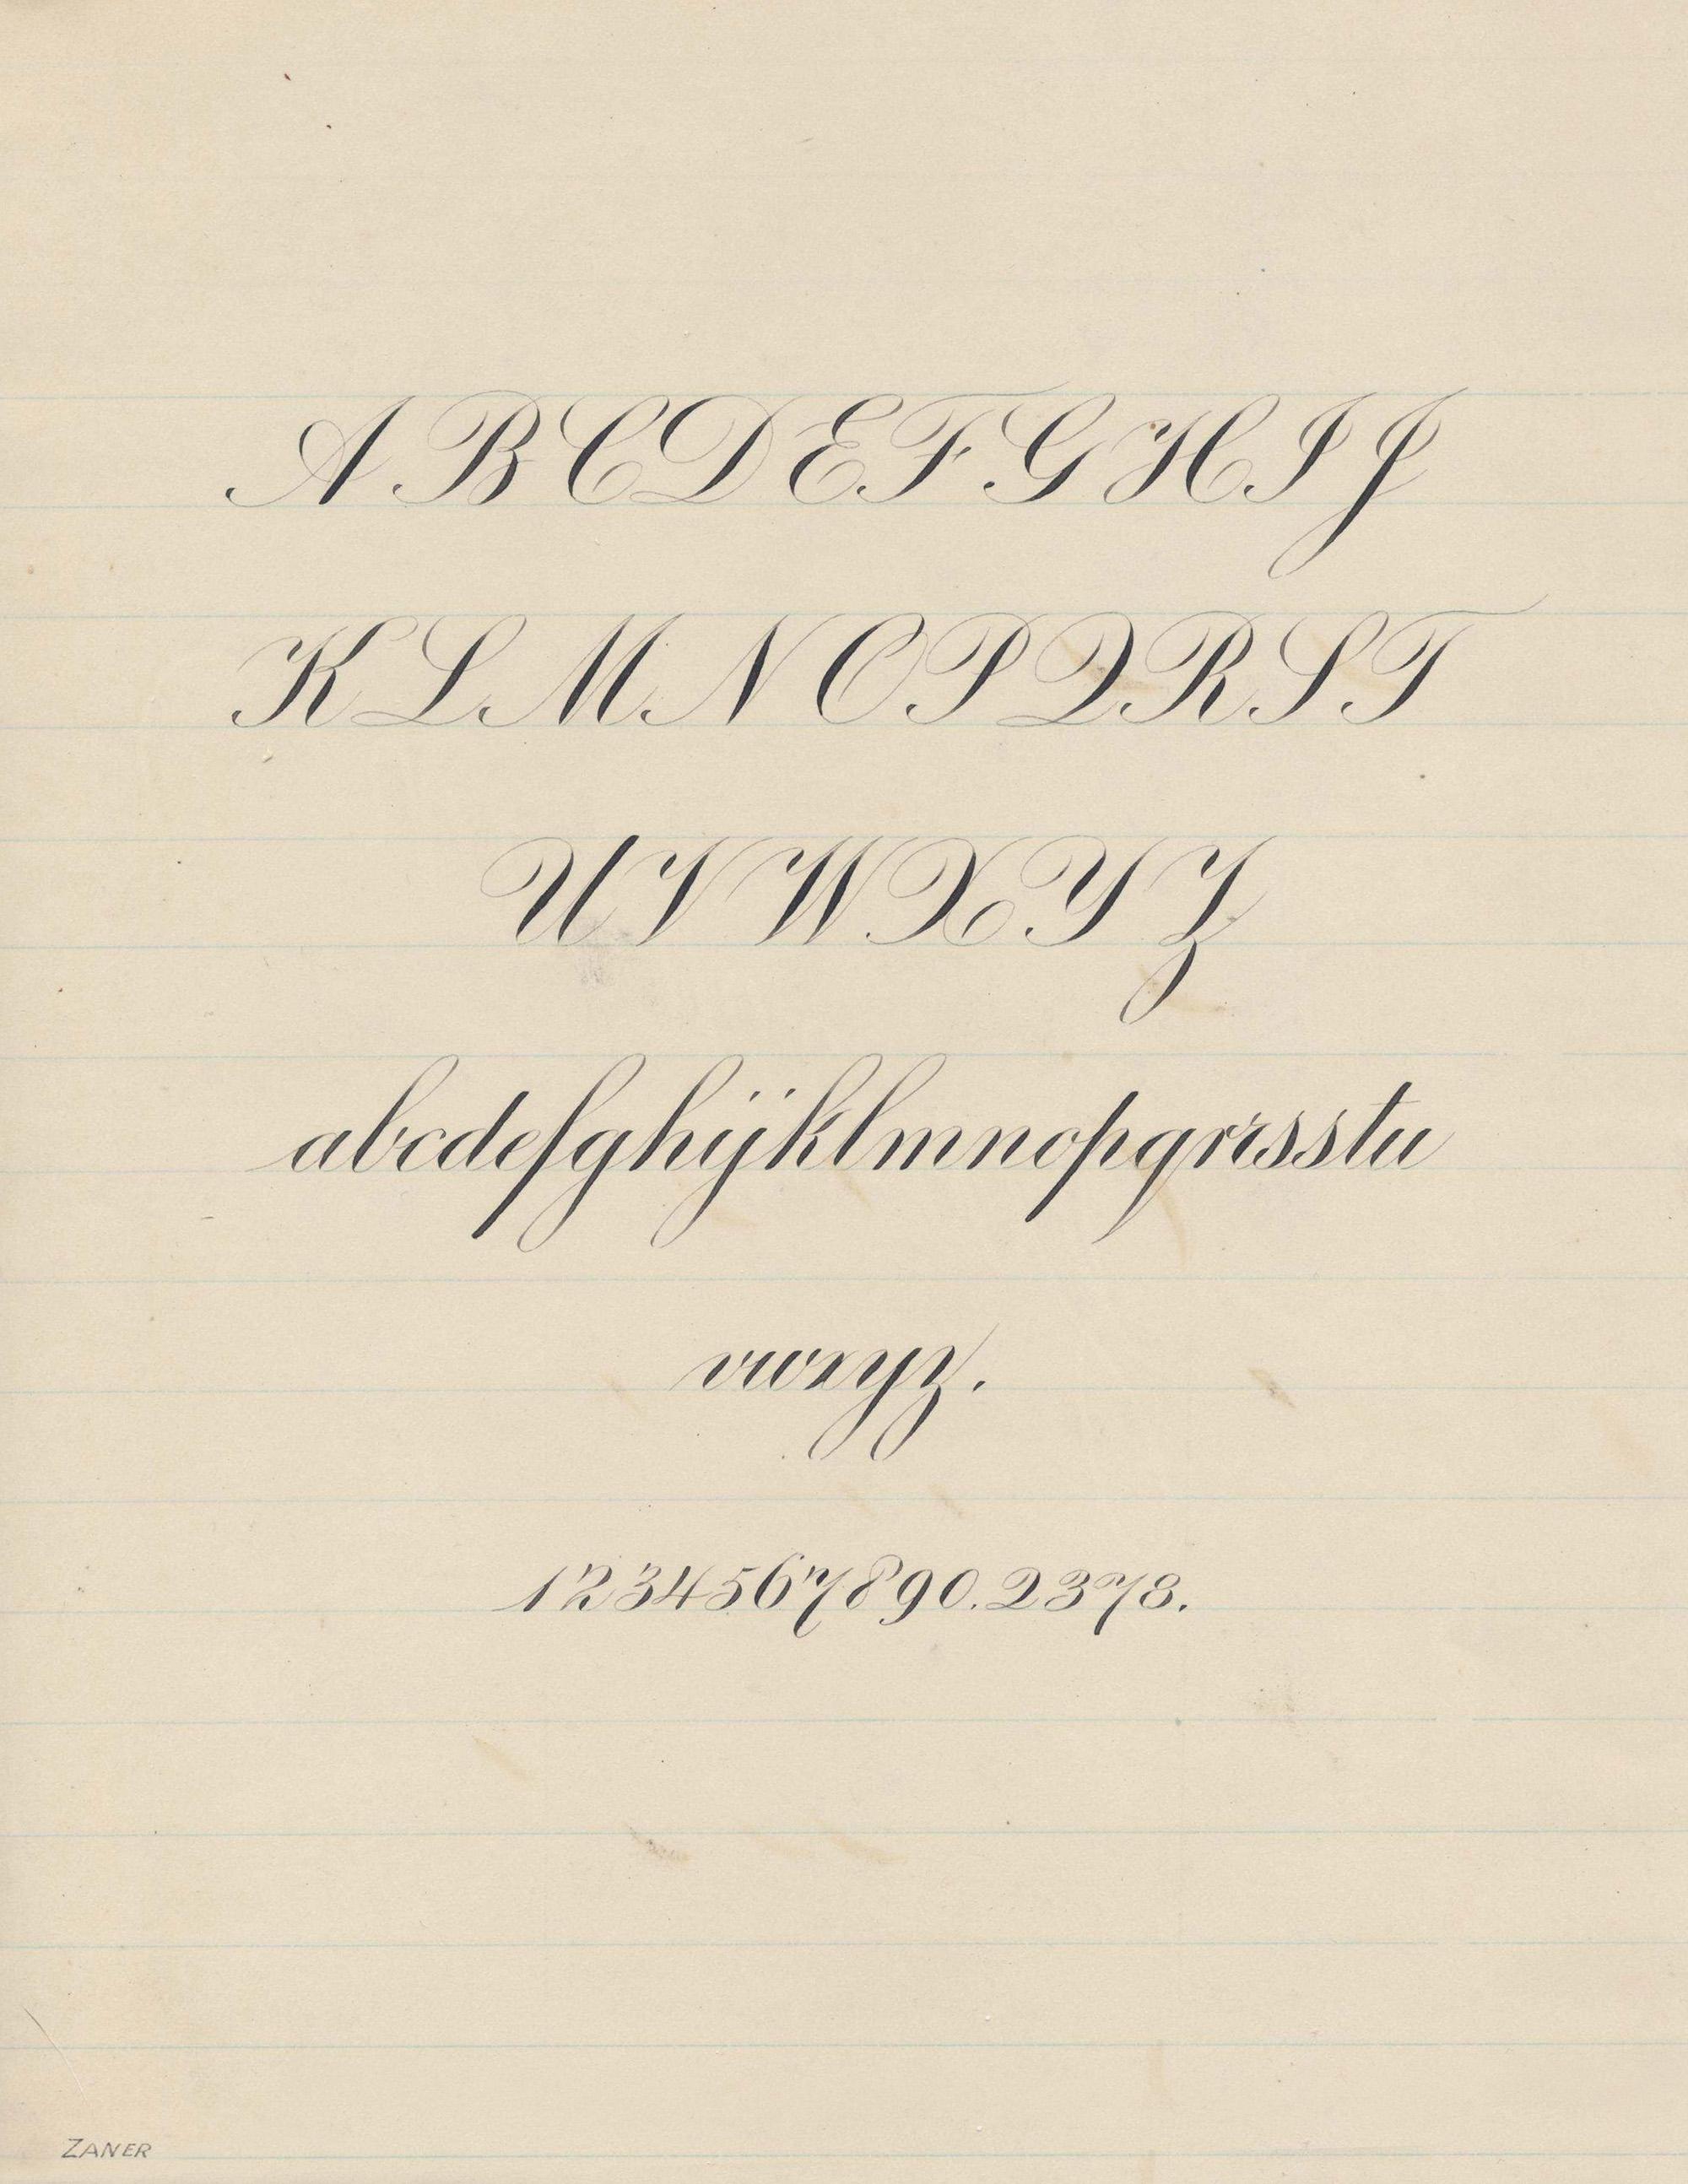 Engrosser's Script Calligraphy Sample